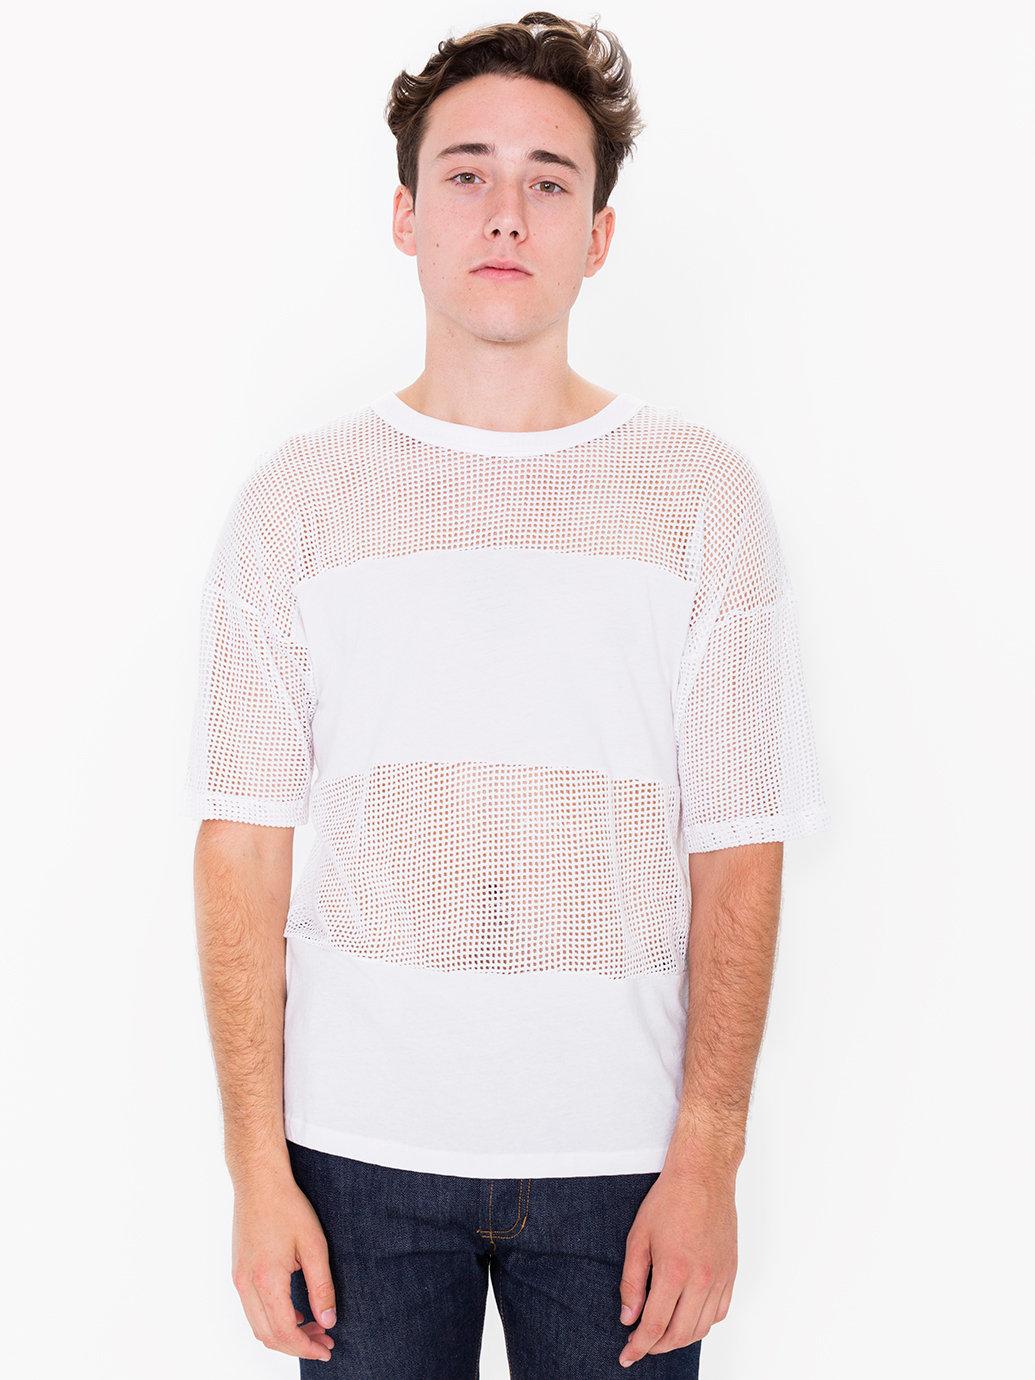 American apparel waffle mesh combo shirt in white for men for American apparel mesh shirt